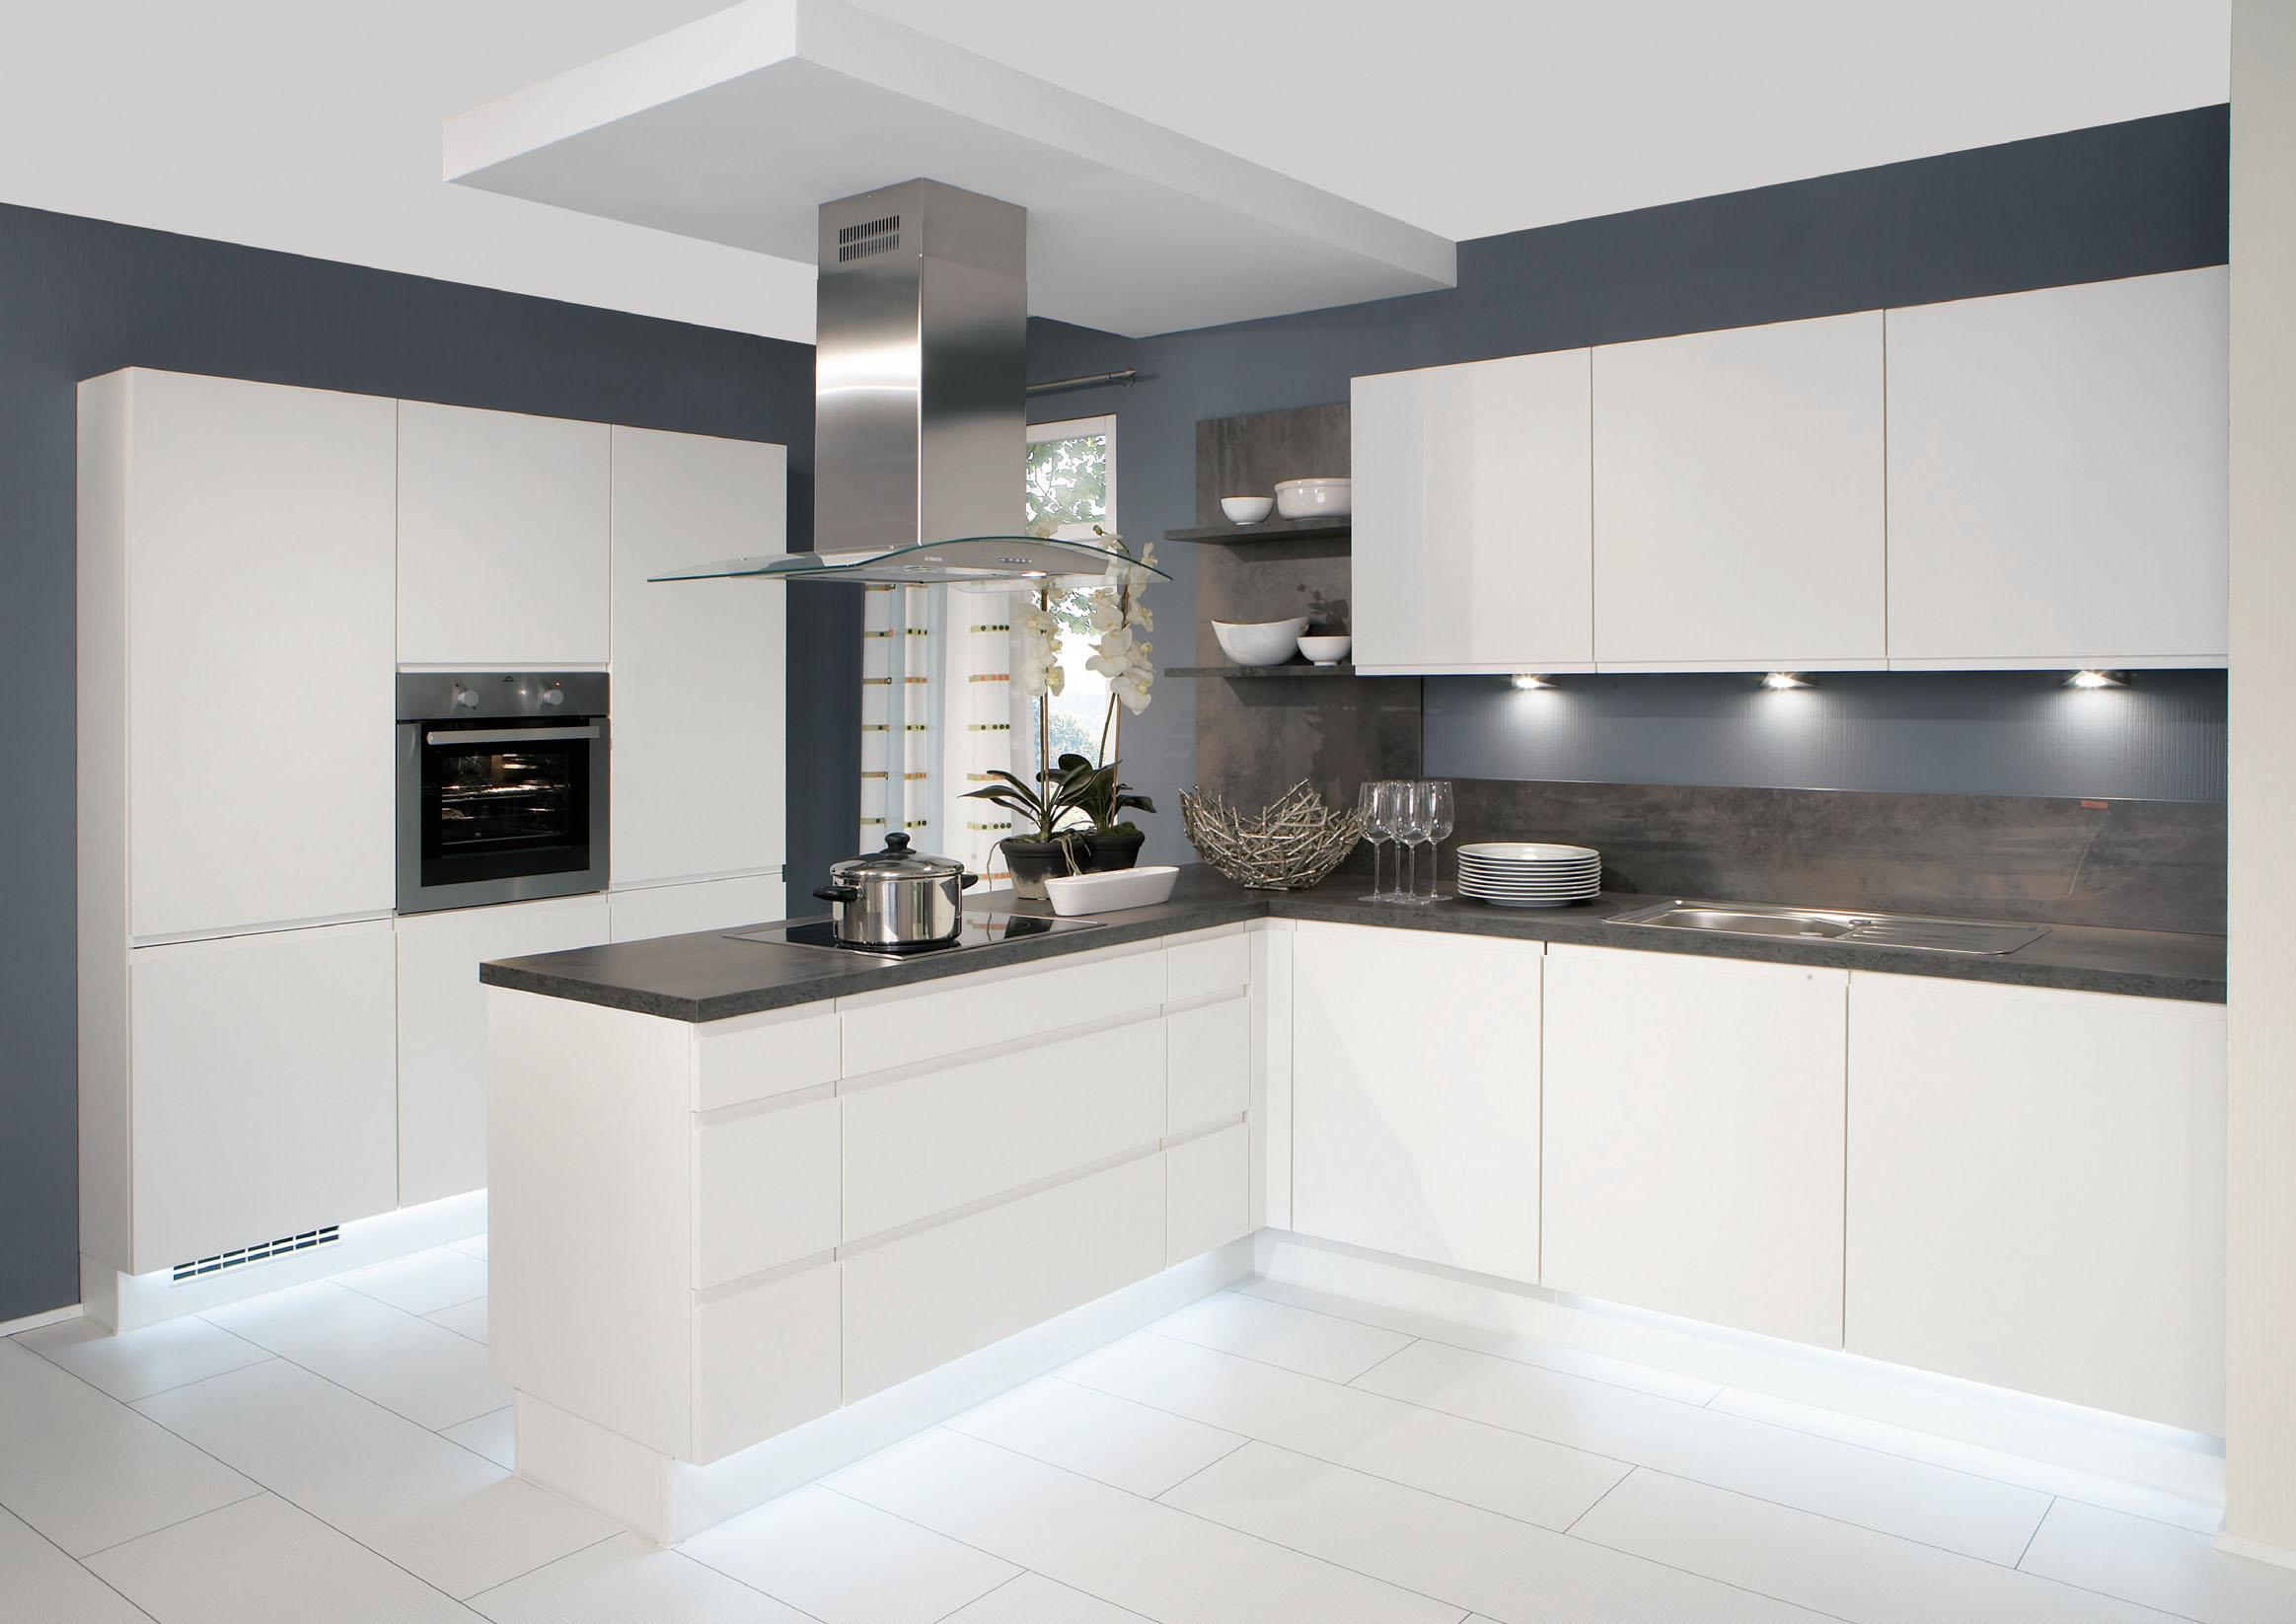 Cocina en forma de L modelo Speed & Rio Cocina con isla de cocción ...